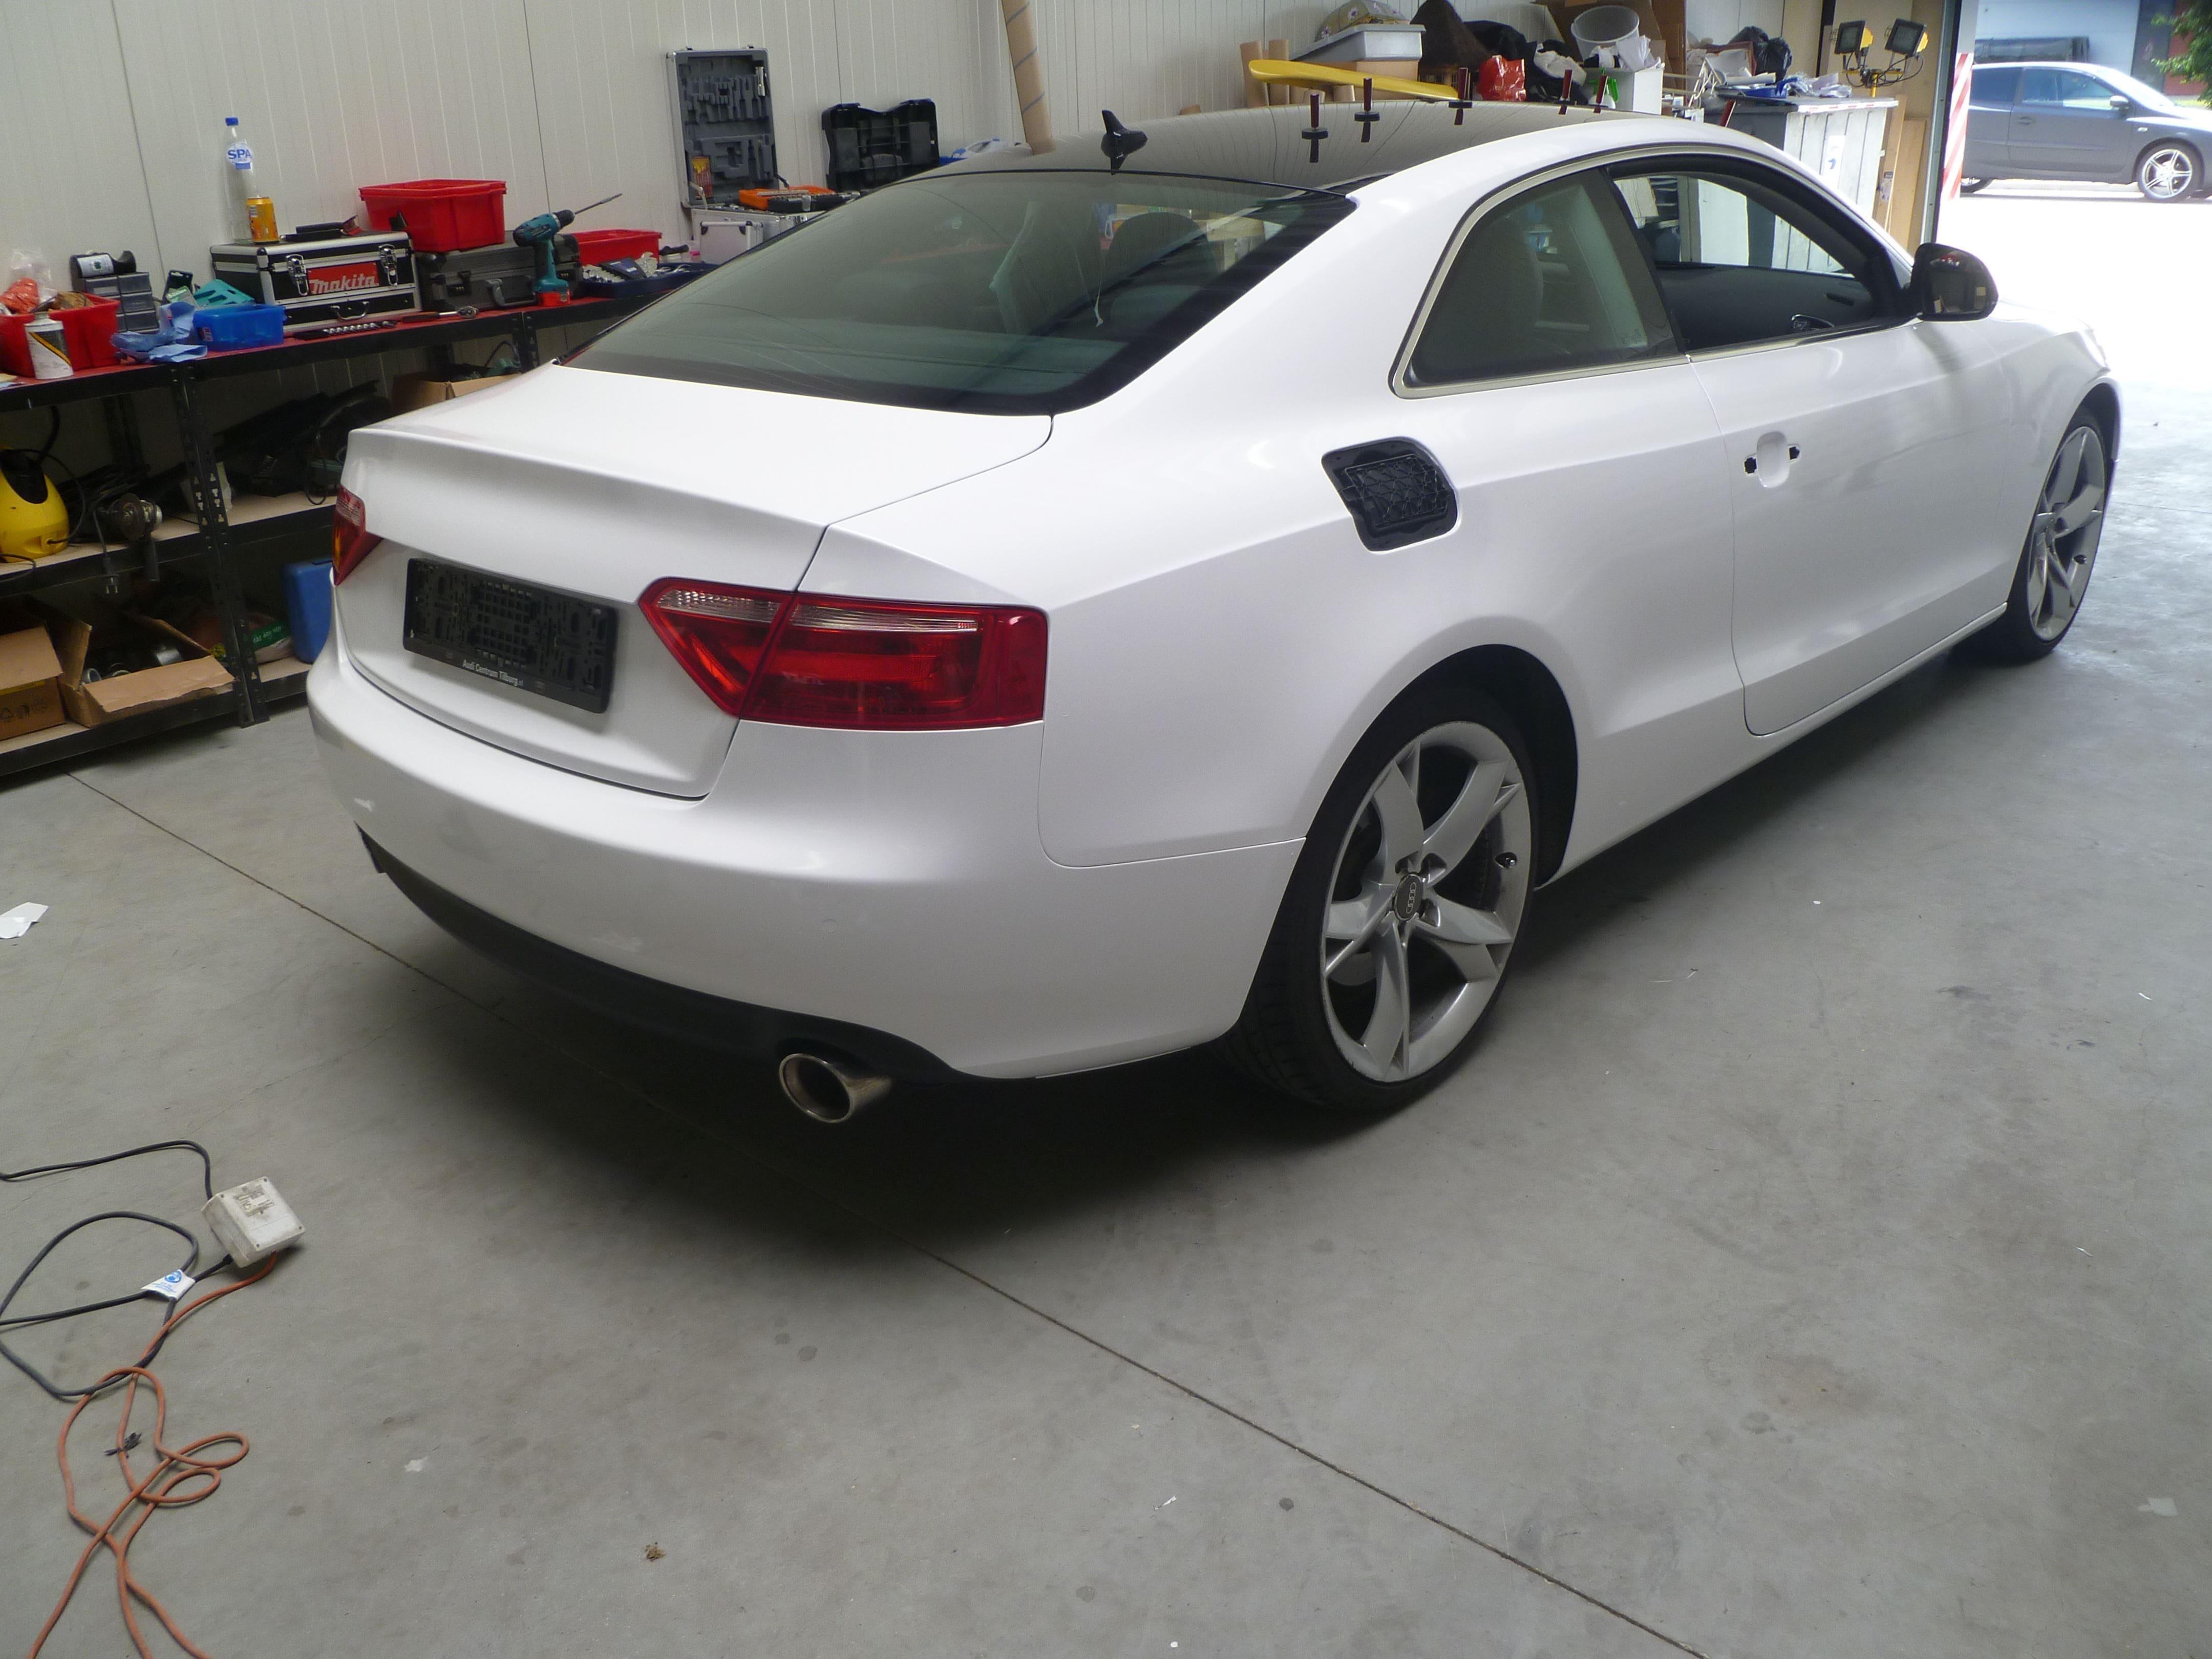 Audi A5 coupe met Metallic Witte Wrap, Carwrapping door Wrapmyride.nu Foto-nr:4727, ©2021